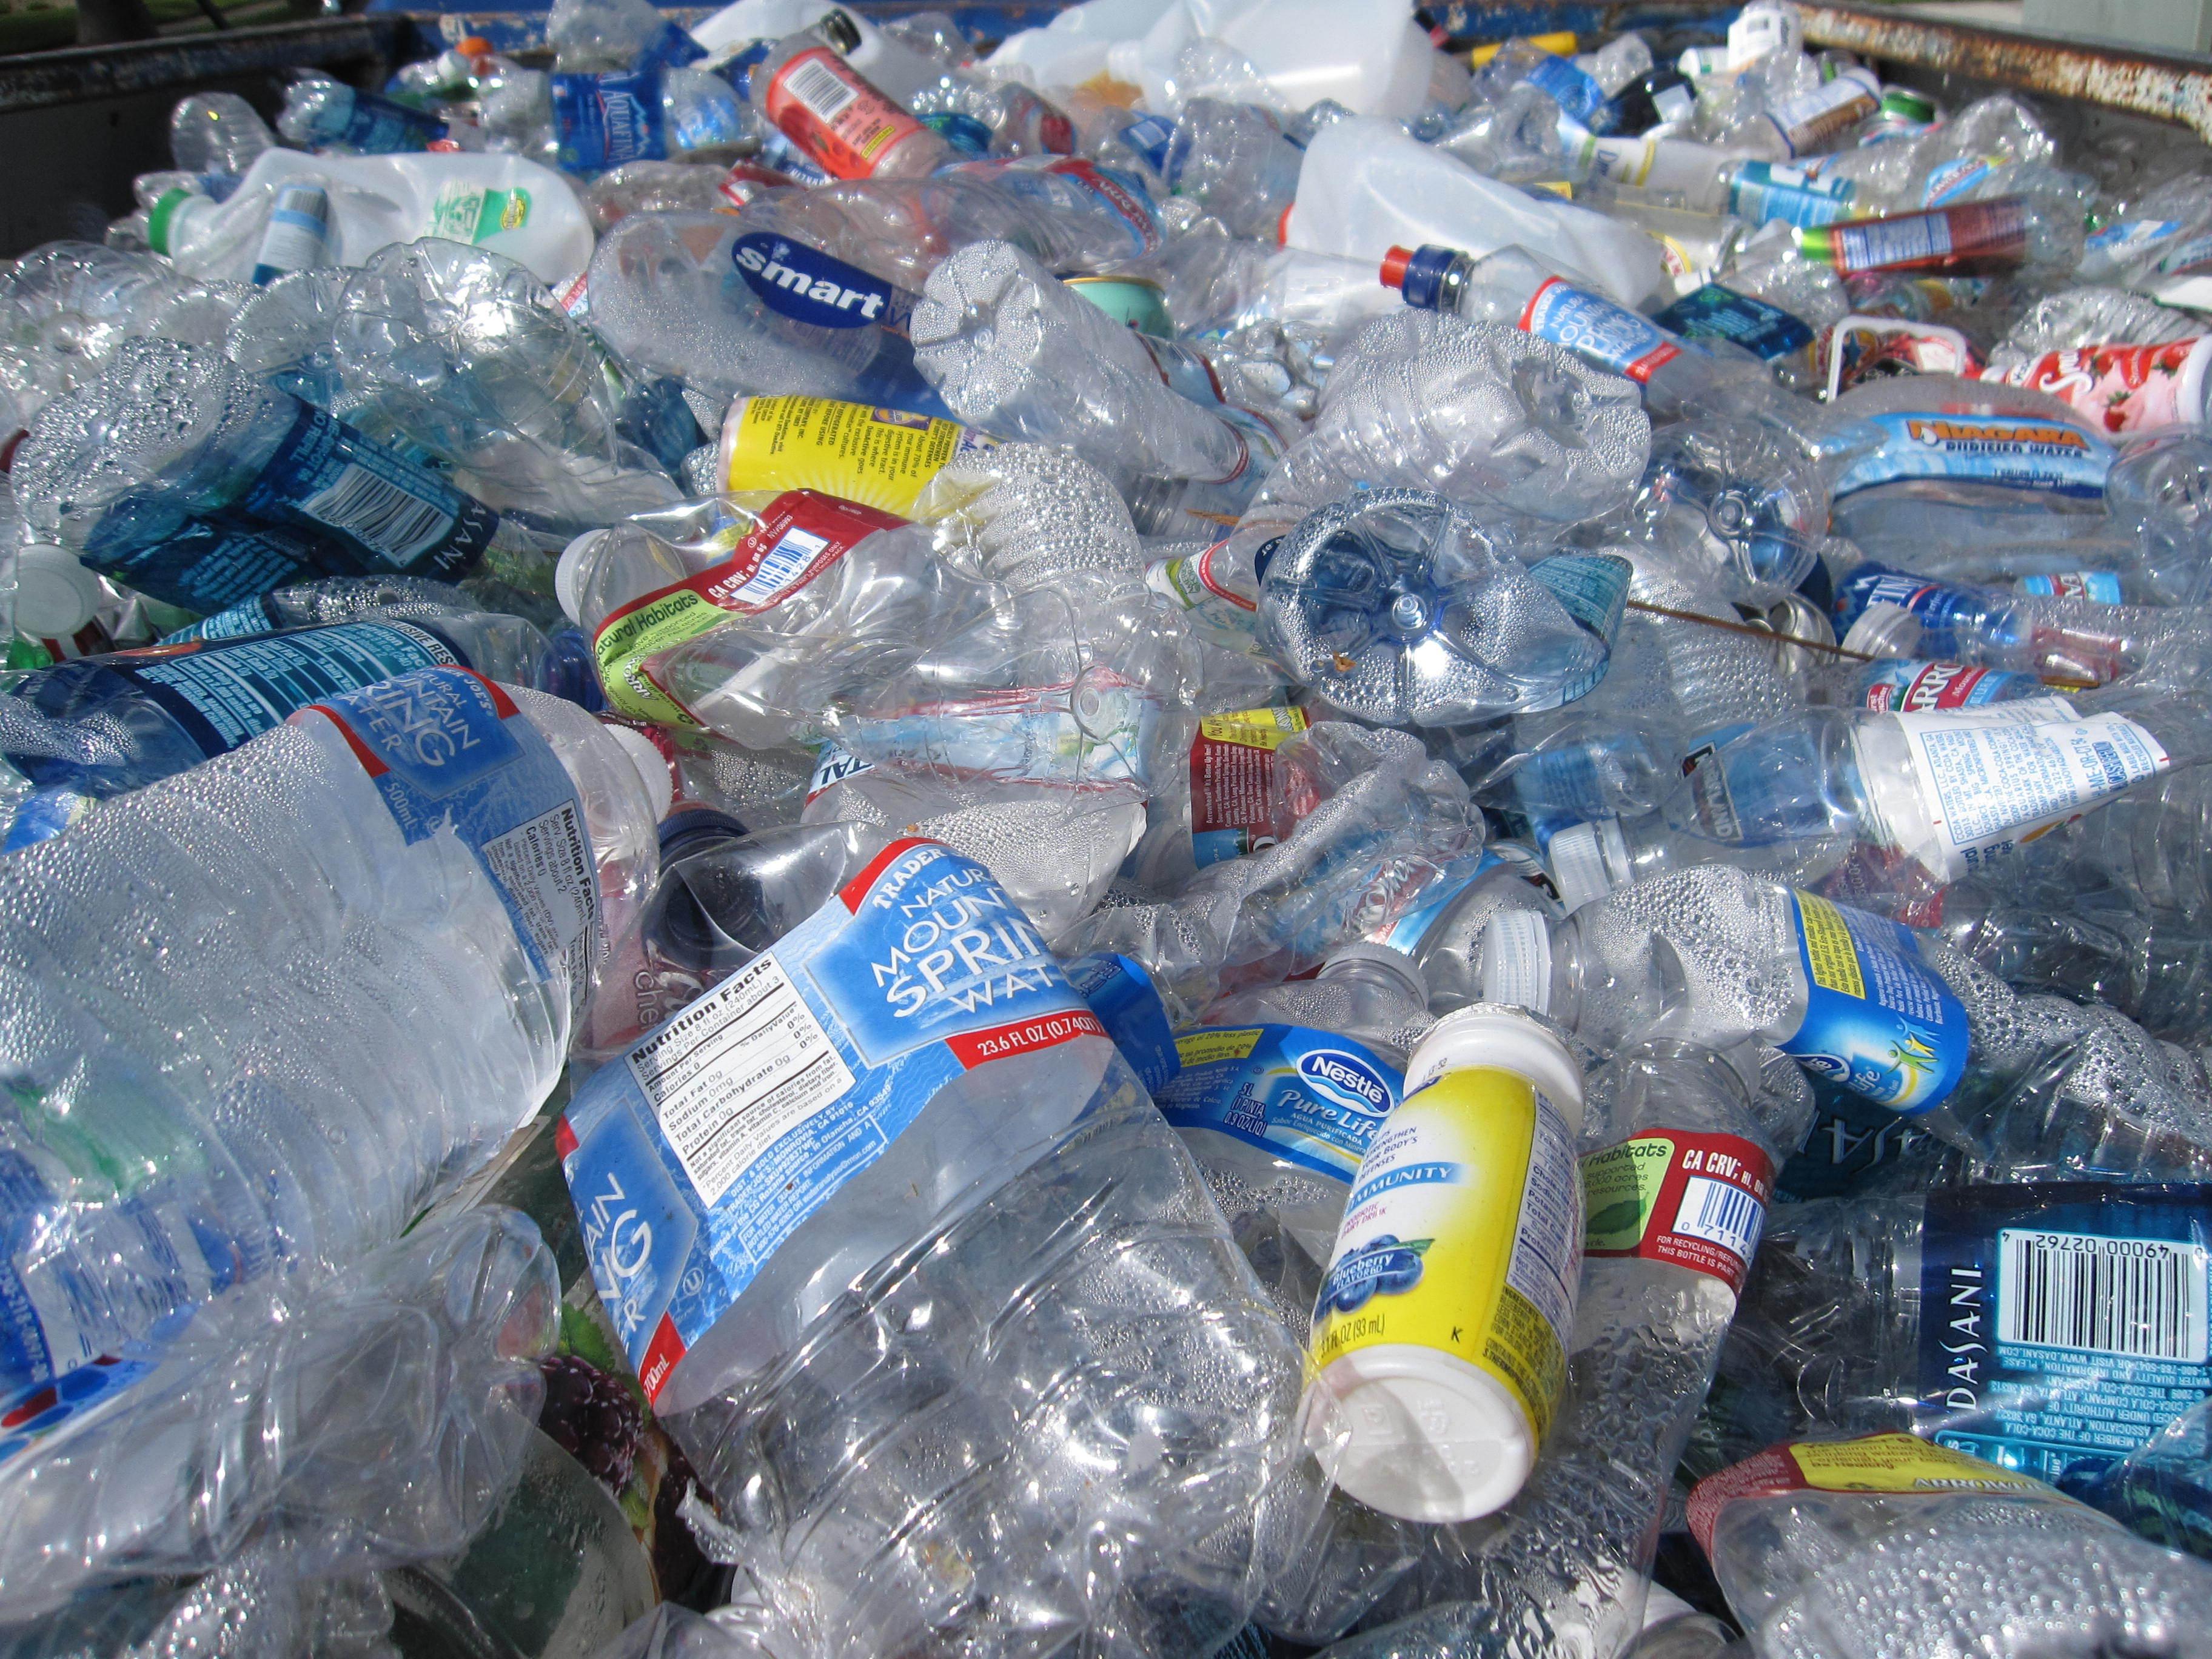 Projeto de lei do PAN sobre plásticos no parlamento na próxima semana